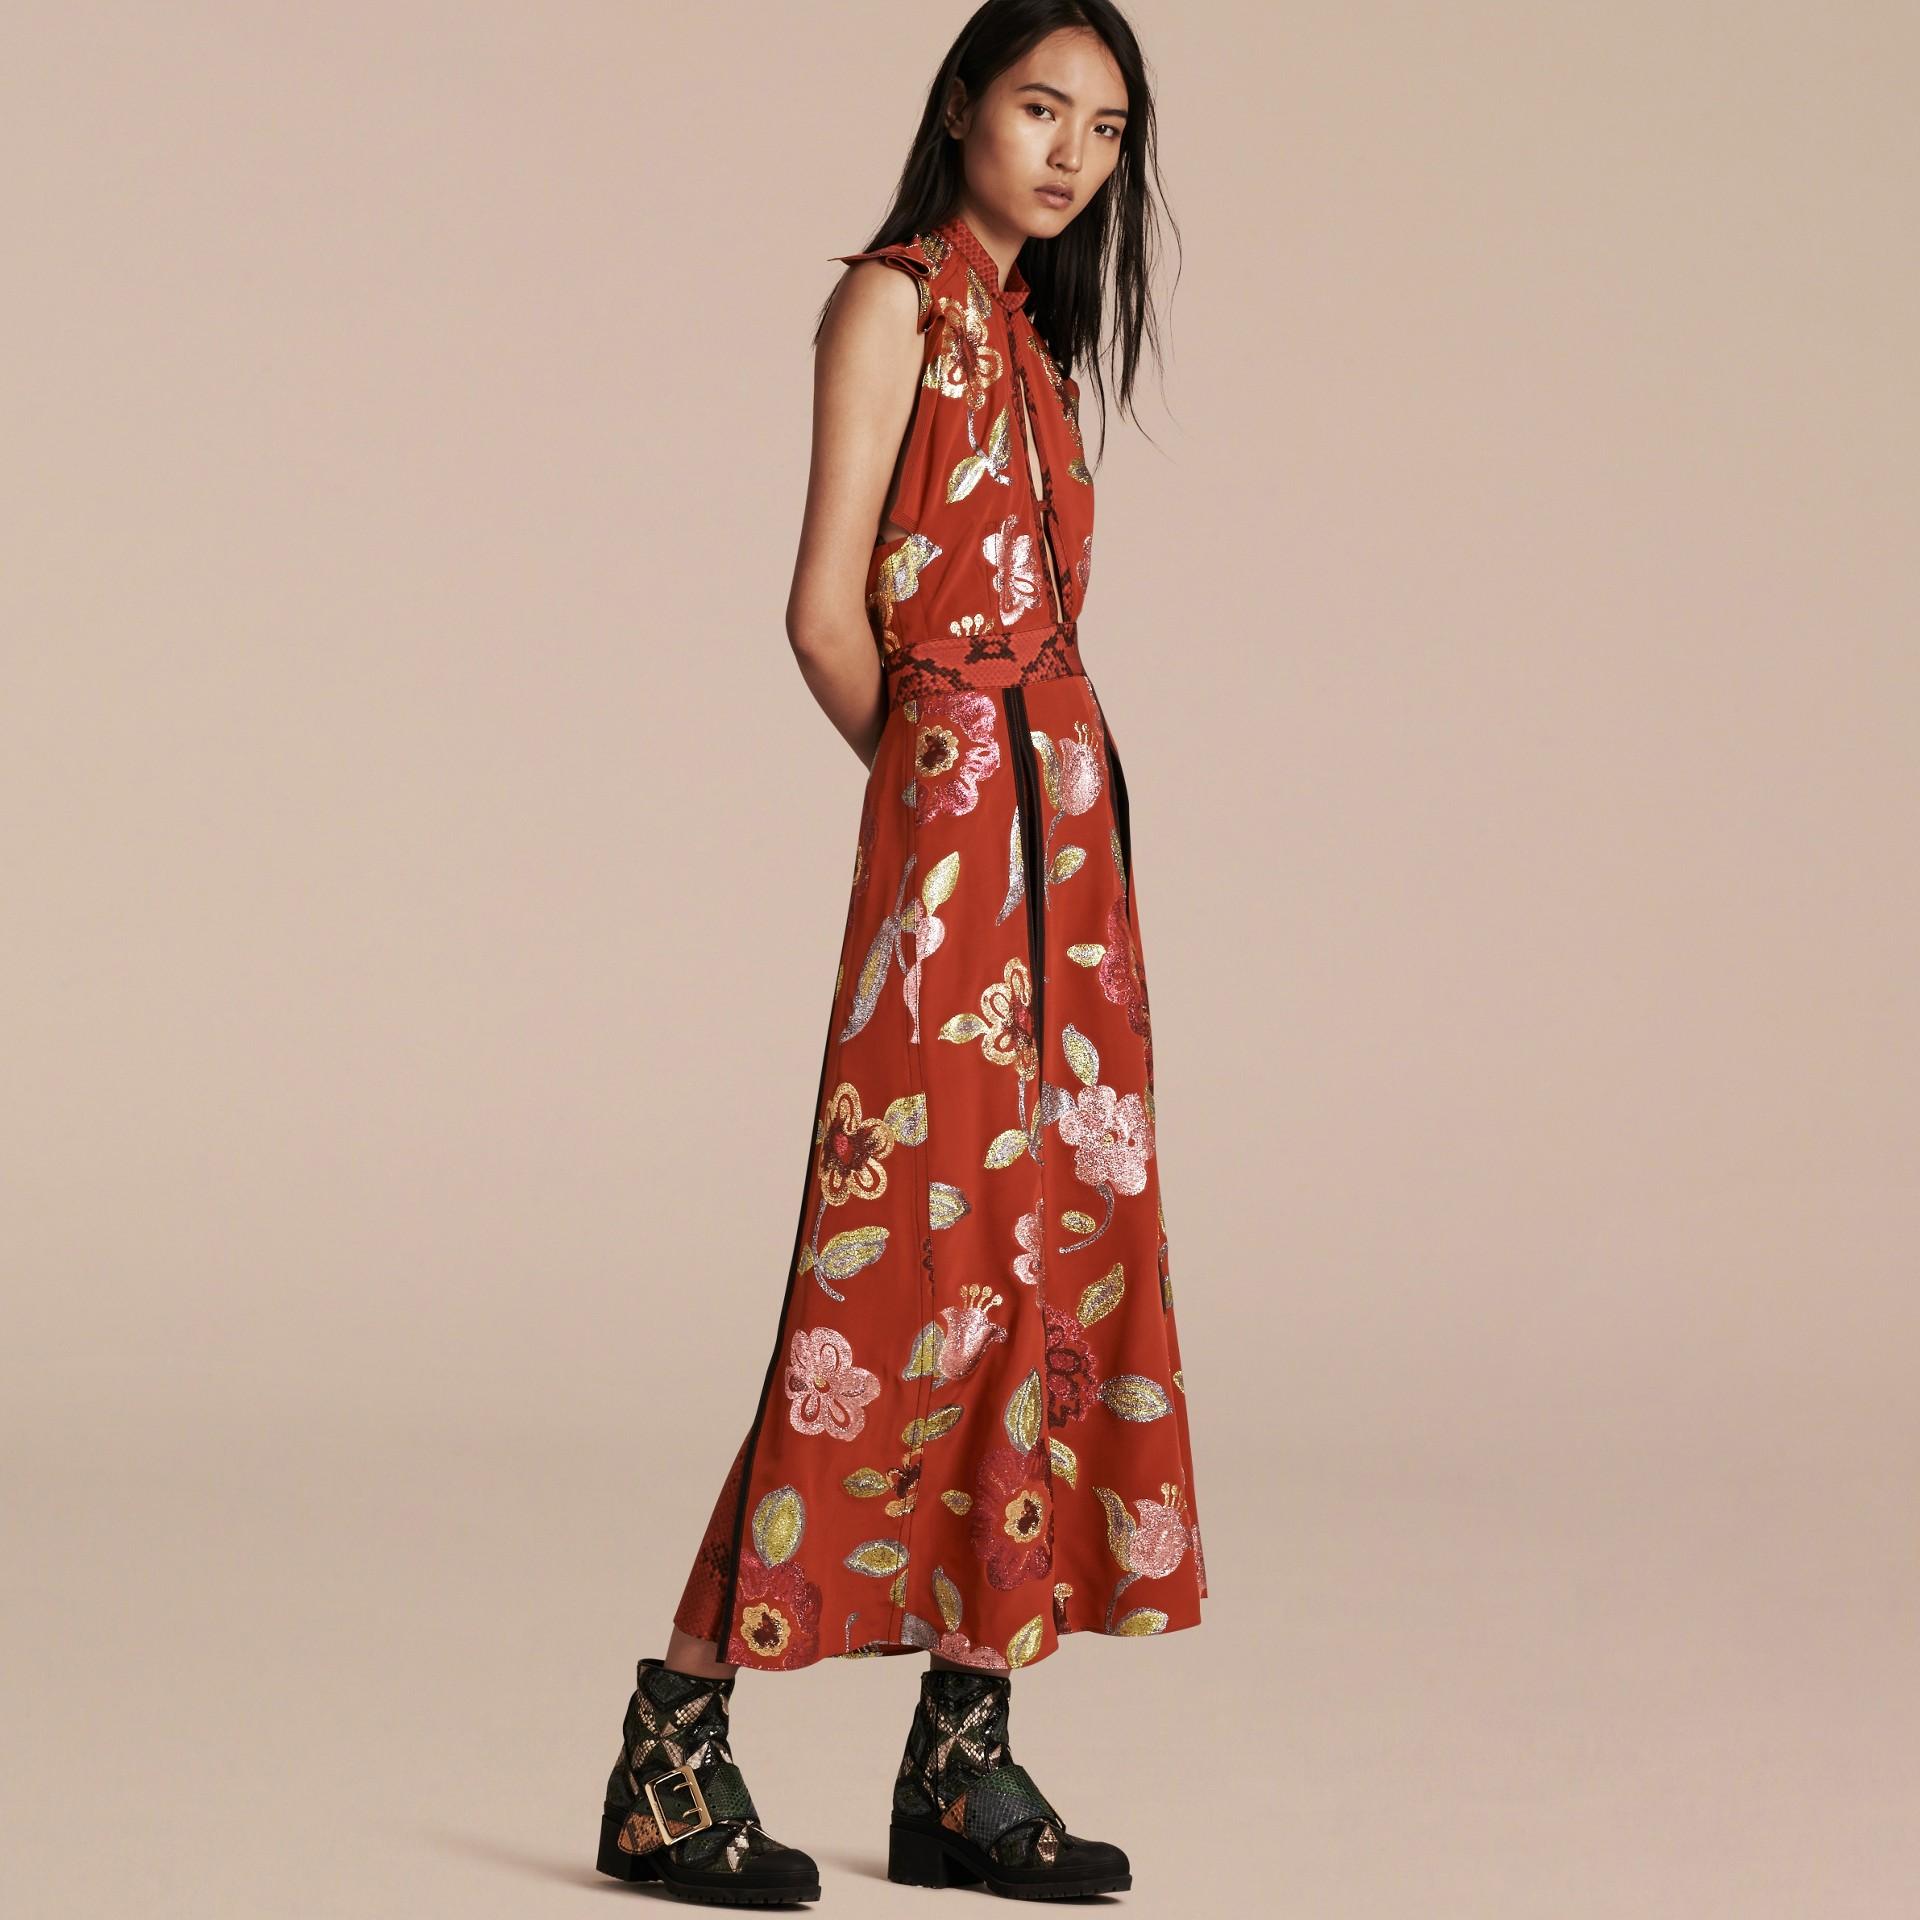 Burnt sienna Floral Fil Coupé Silk Dress - gallery image 1